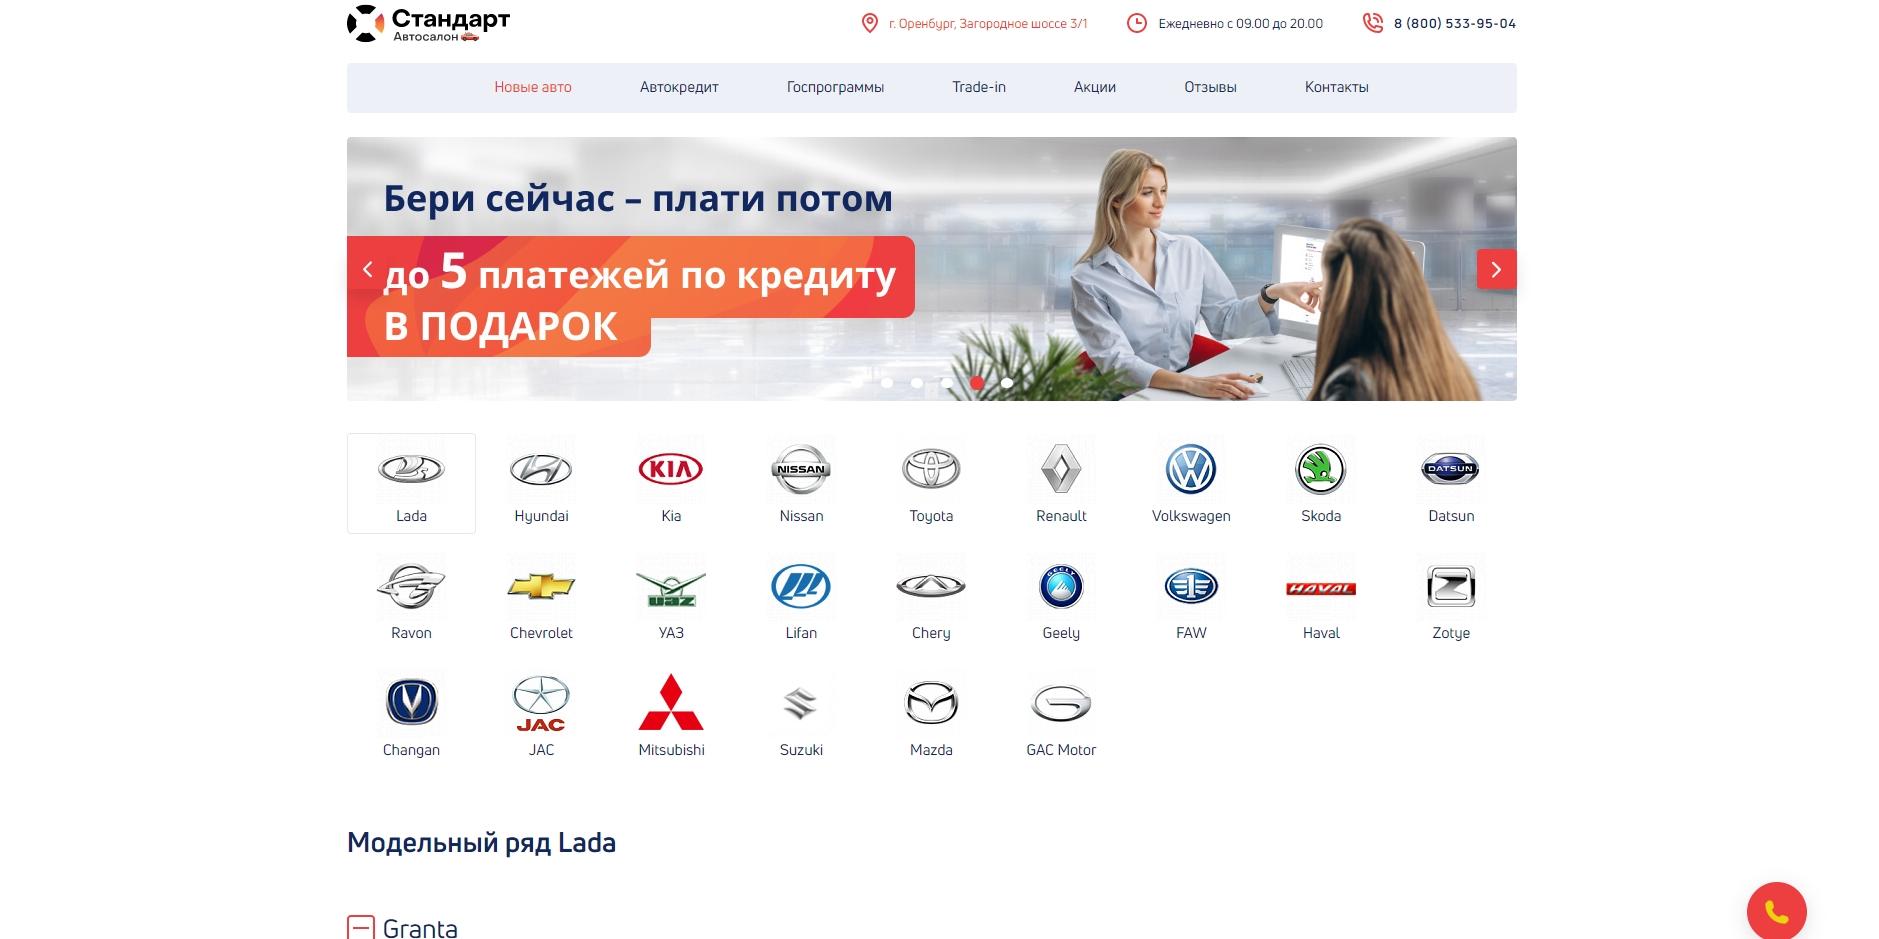 Автосалон Стандарт (Оренбург)